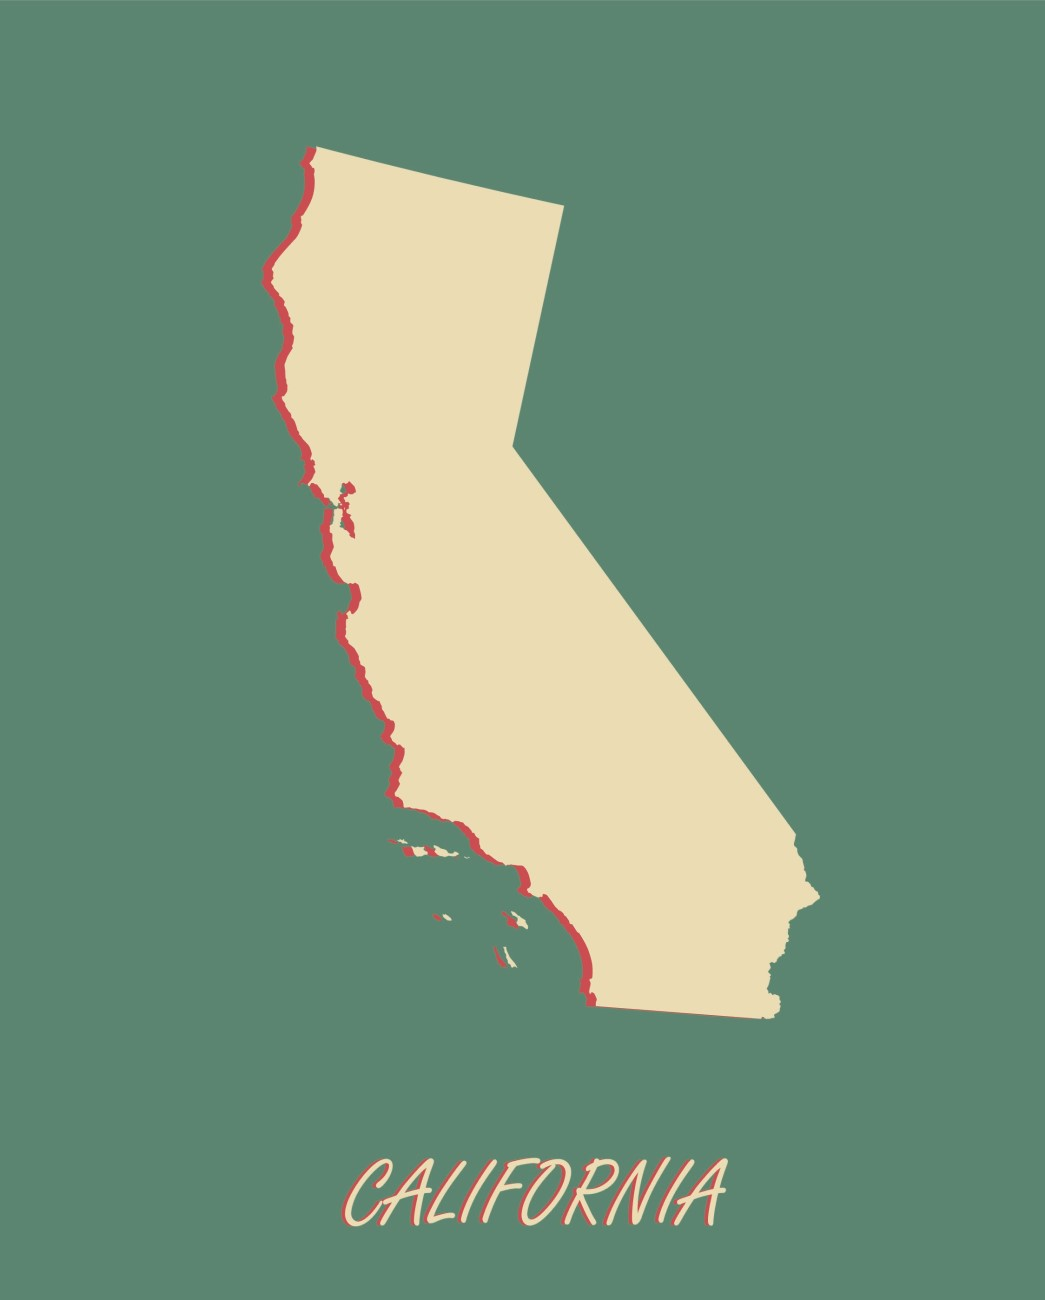 California Tax & Labor Law Summary - Care com HomePay